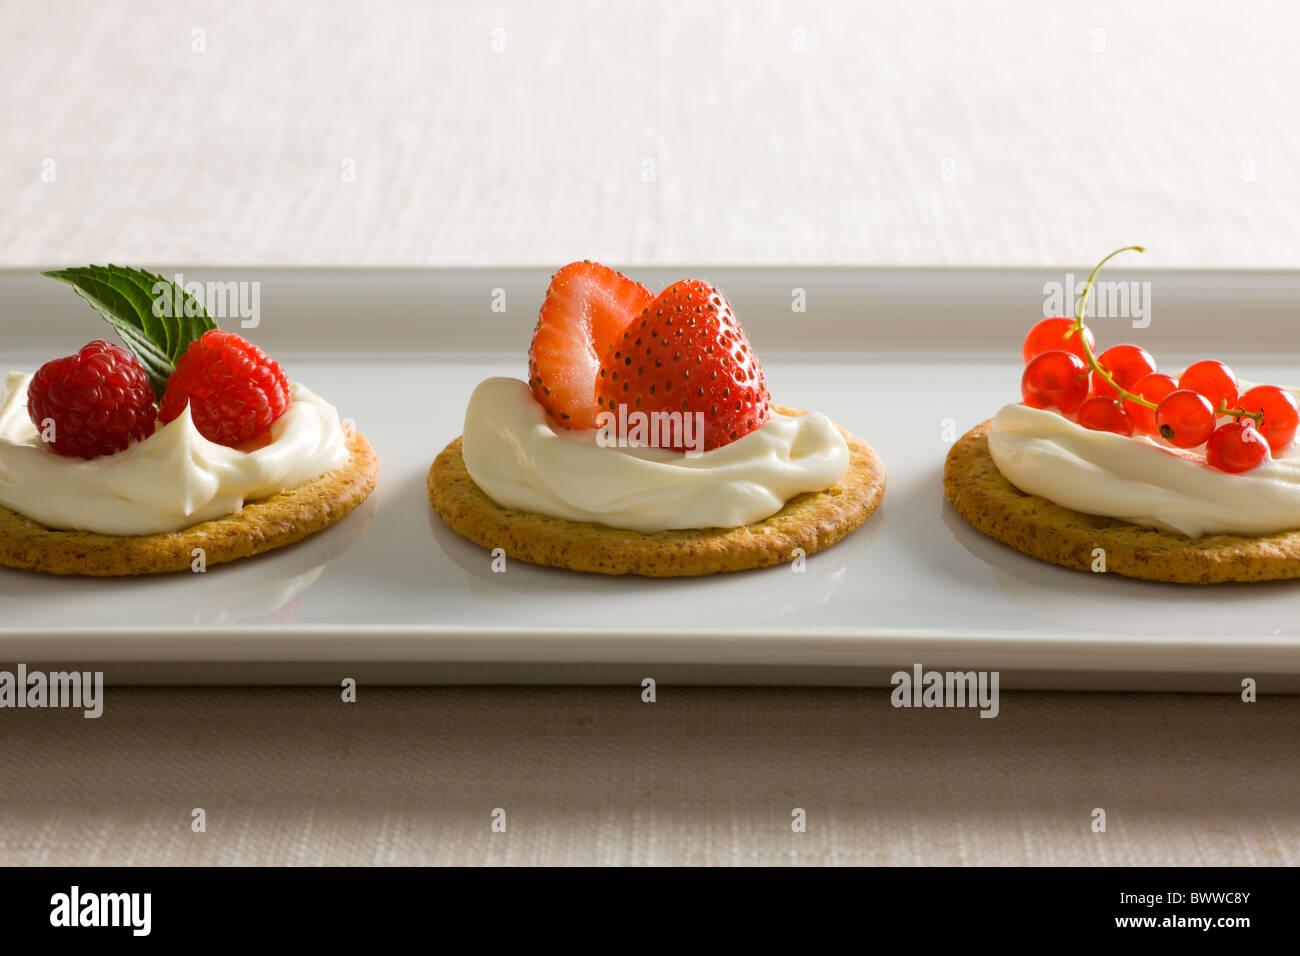 Kekse mit cremiger Käse verteilen, garniert mit Himbeeren, Minze, Erdbeeren, rote Johannisbeere und gelben Stockbild